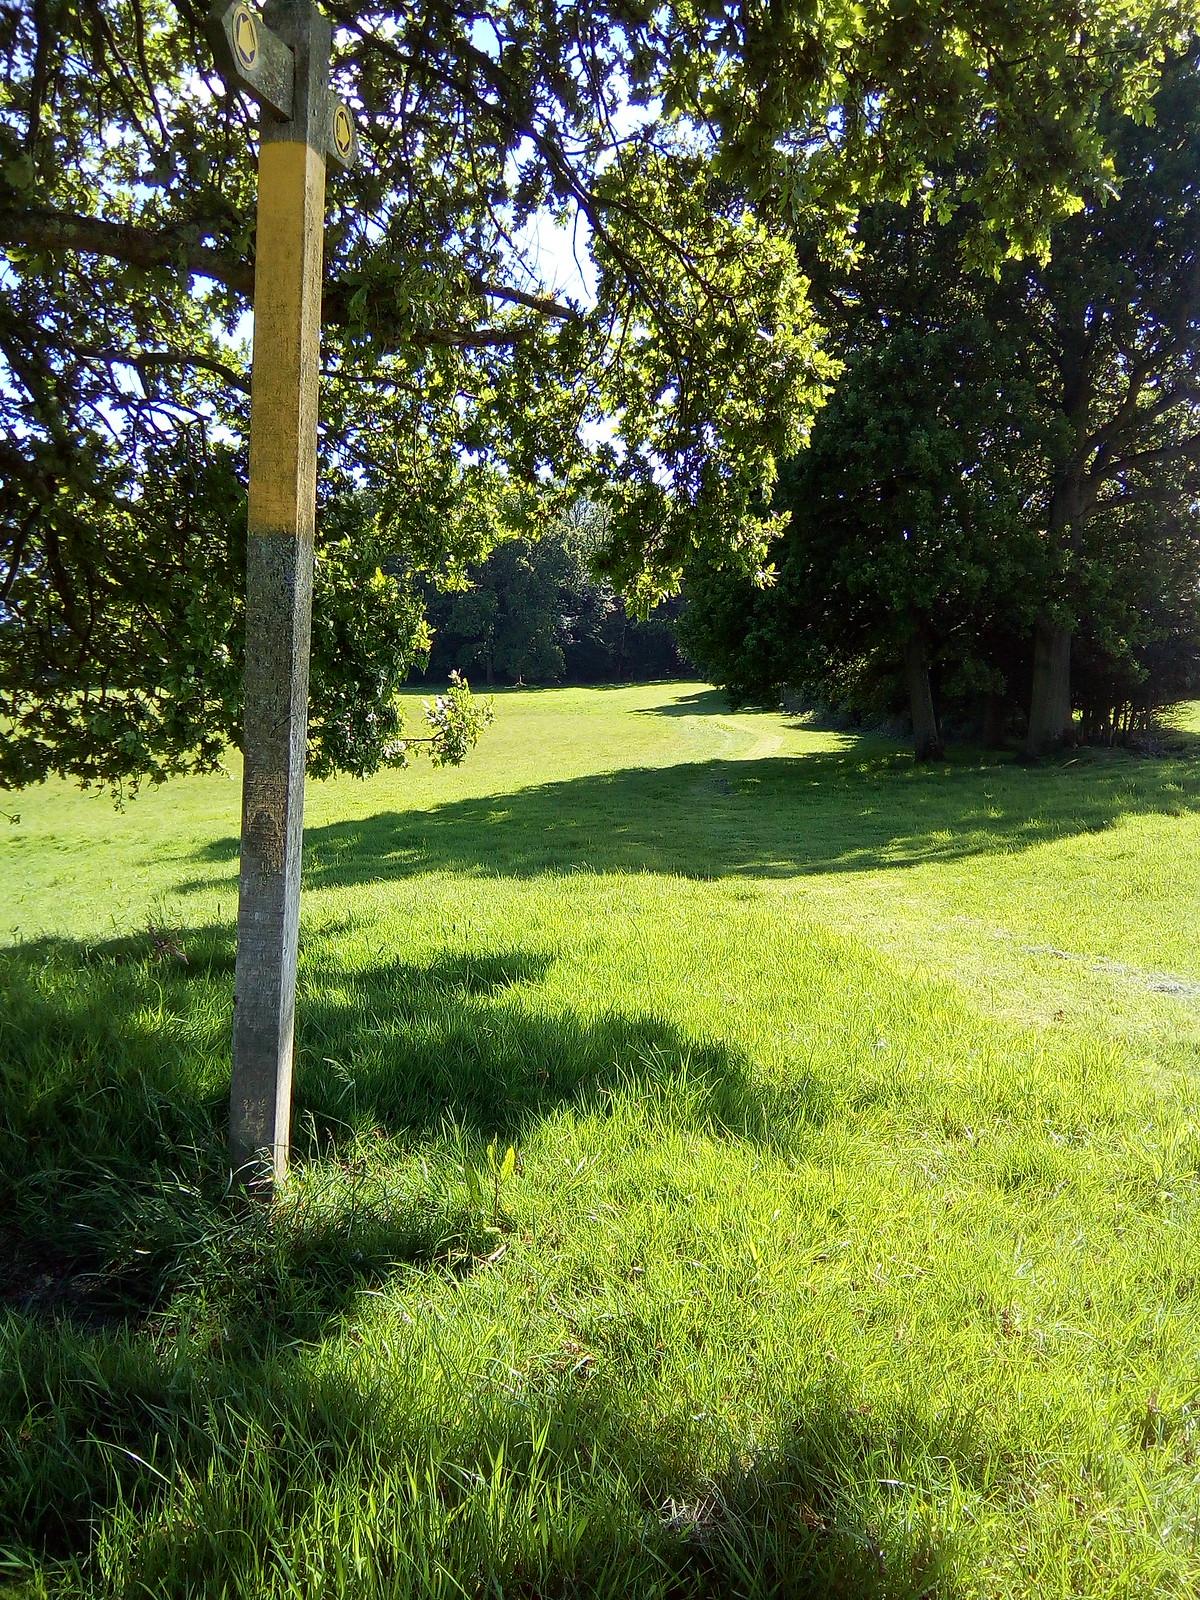 Meander gently between fields